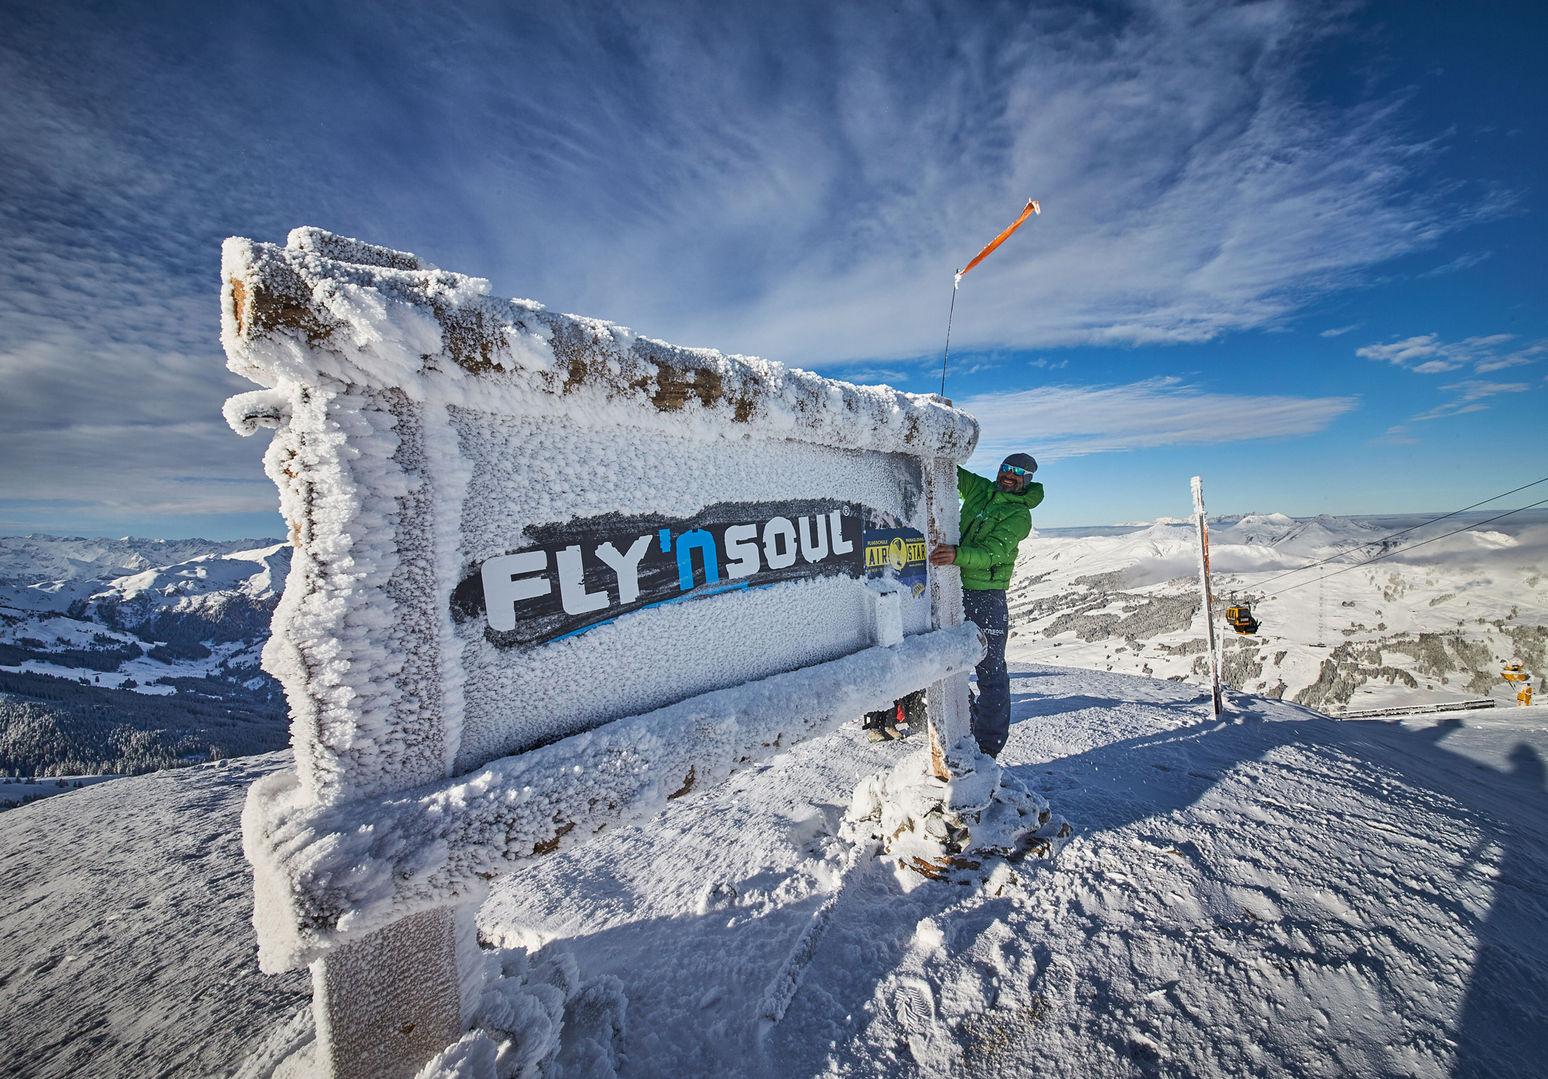 Winter Flynsoul.jpg